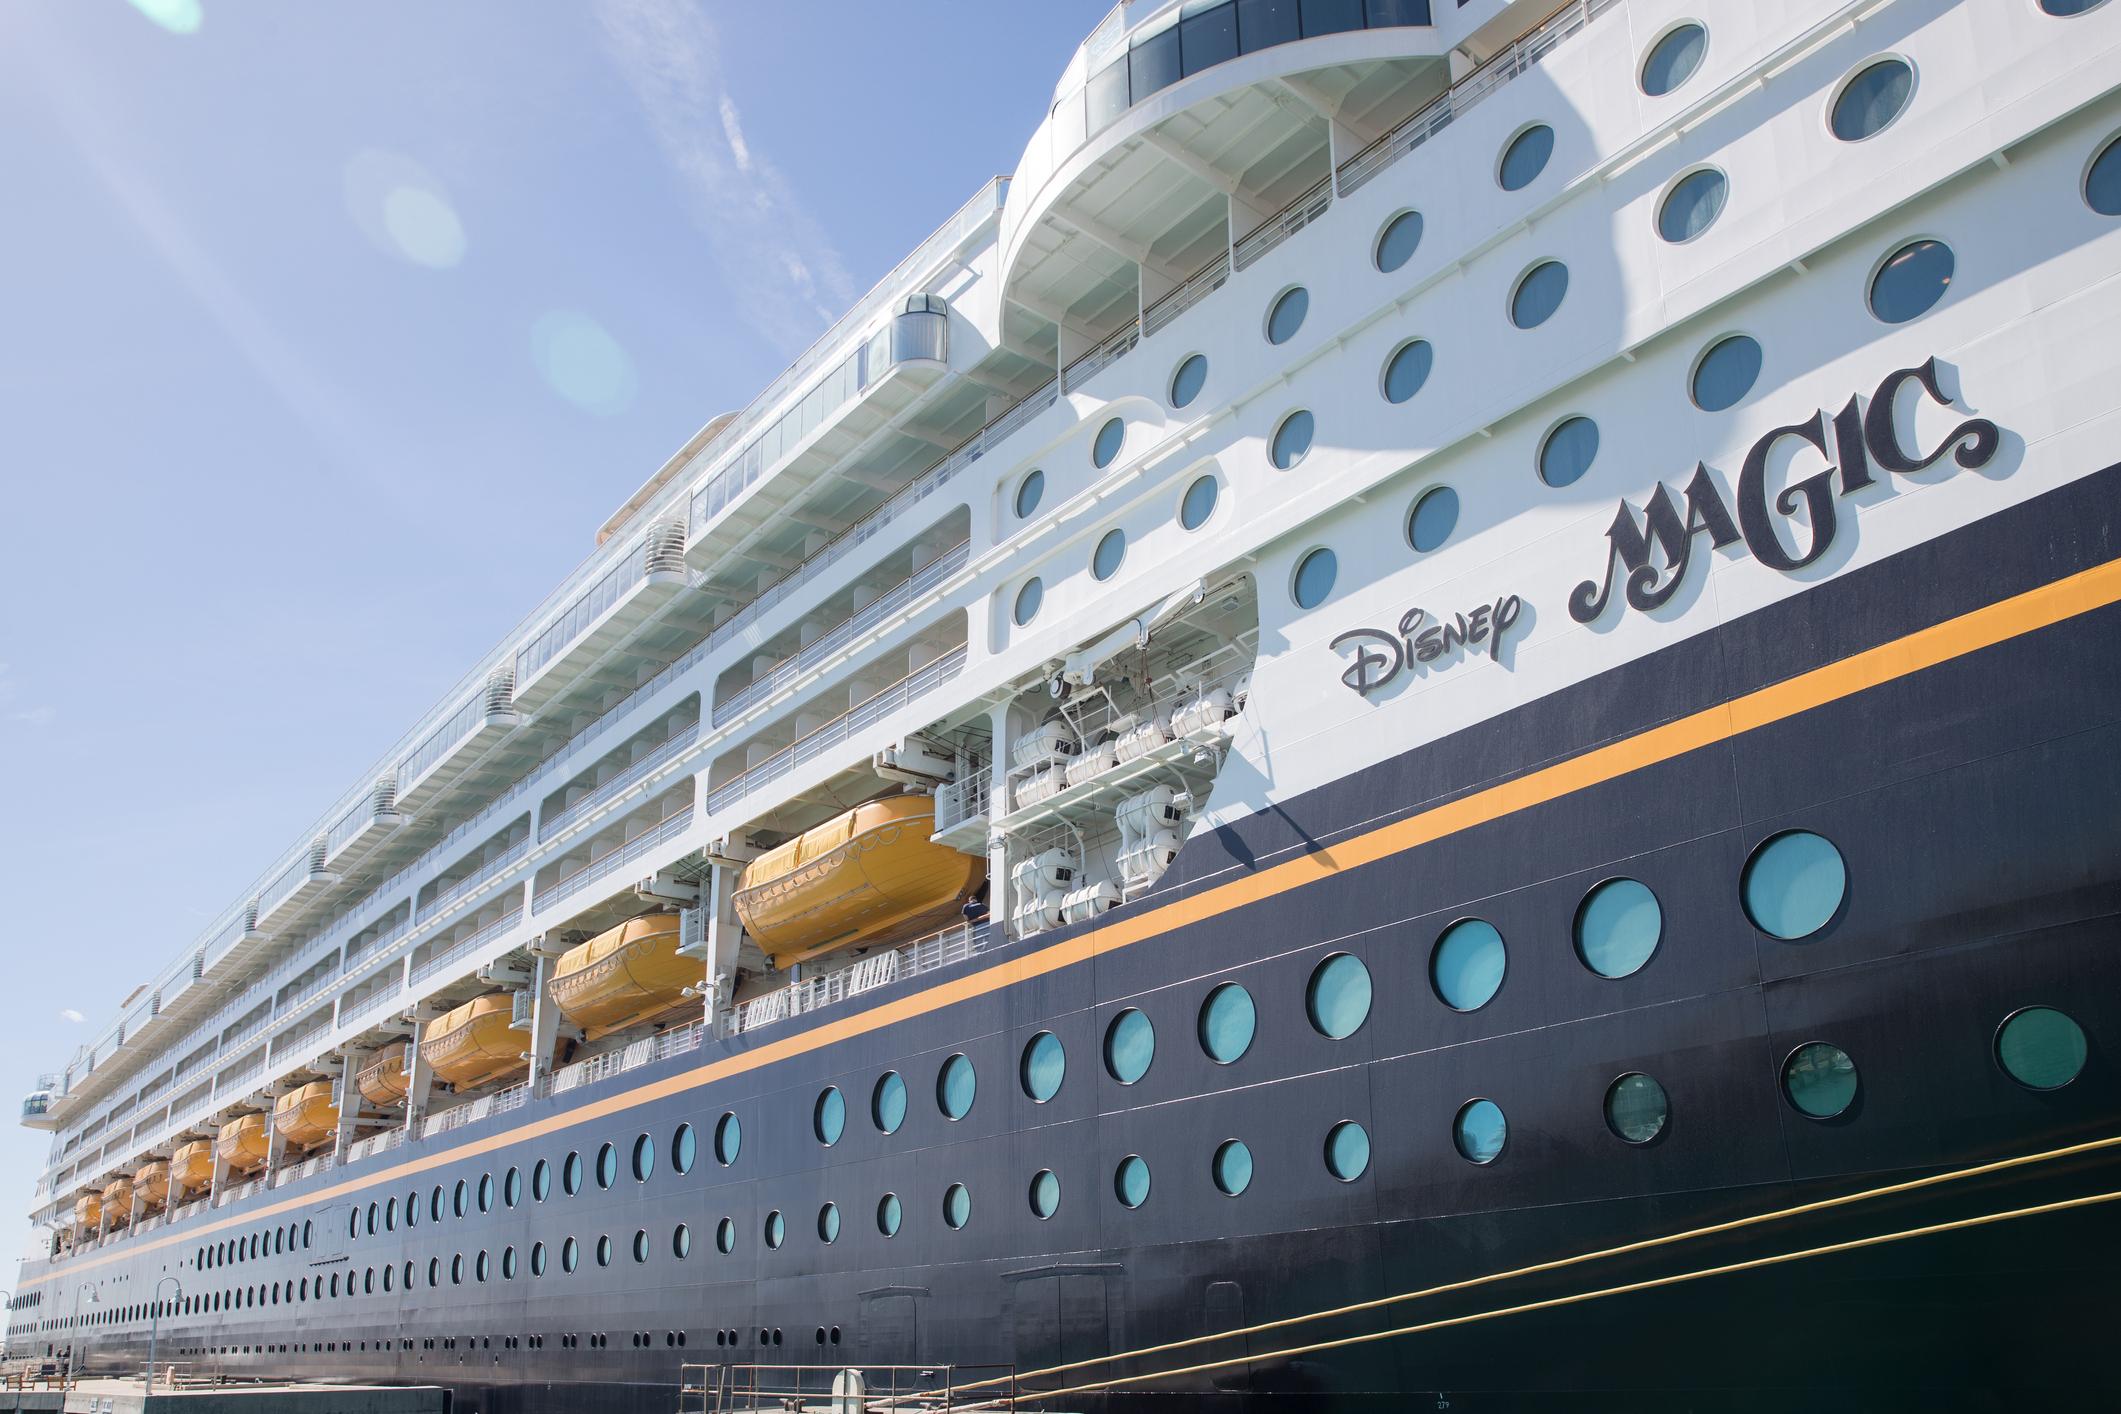 Cruise liner Disney Magic at Key West, Florida